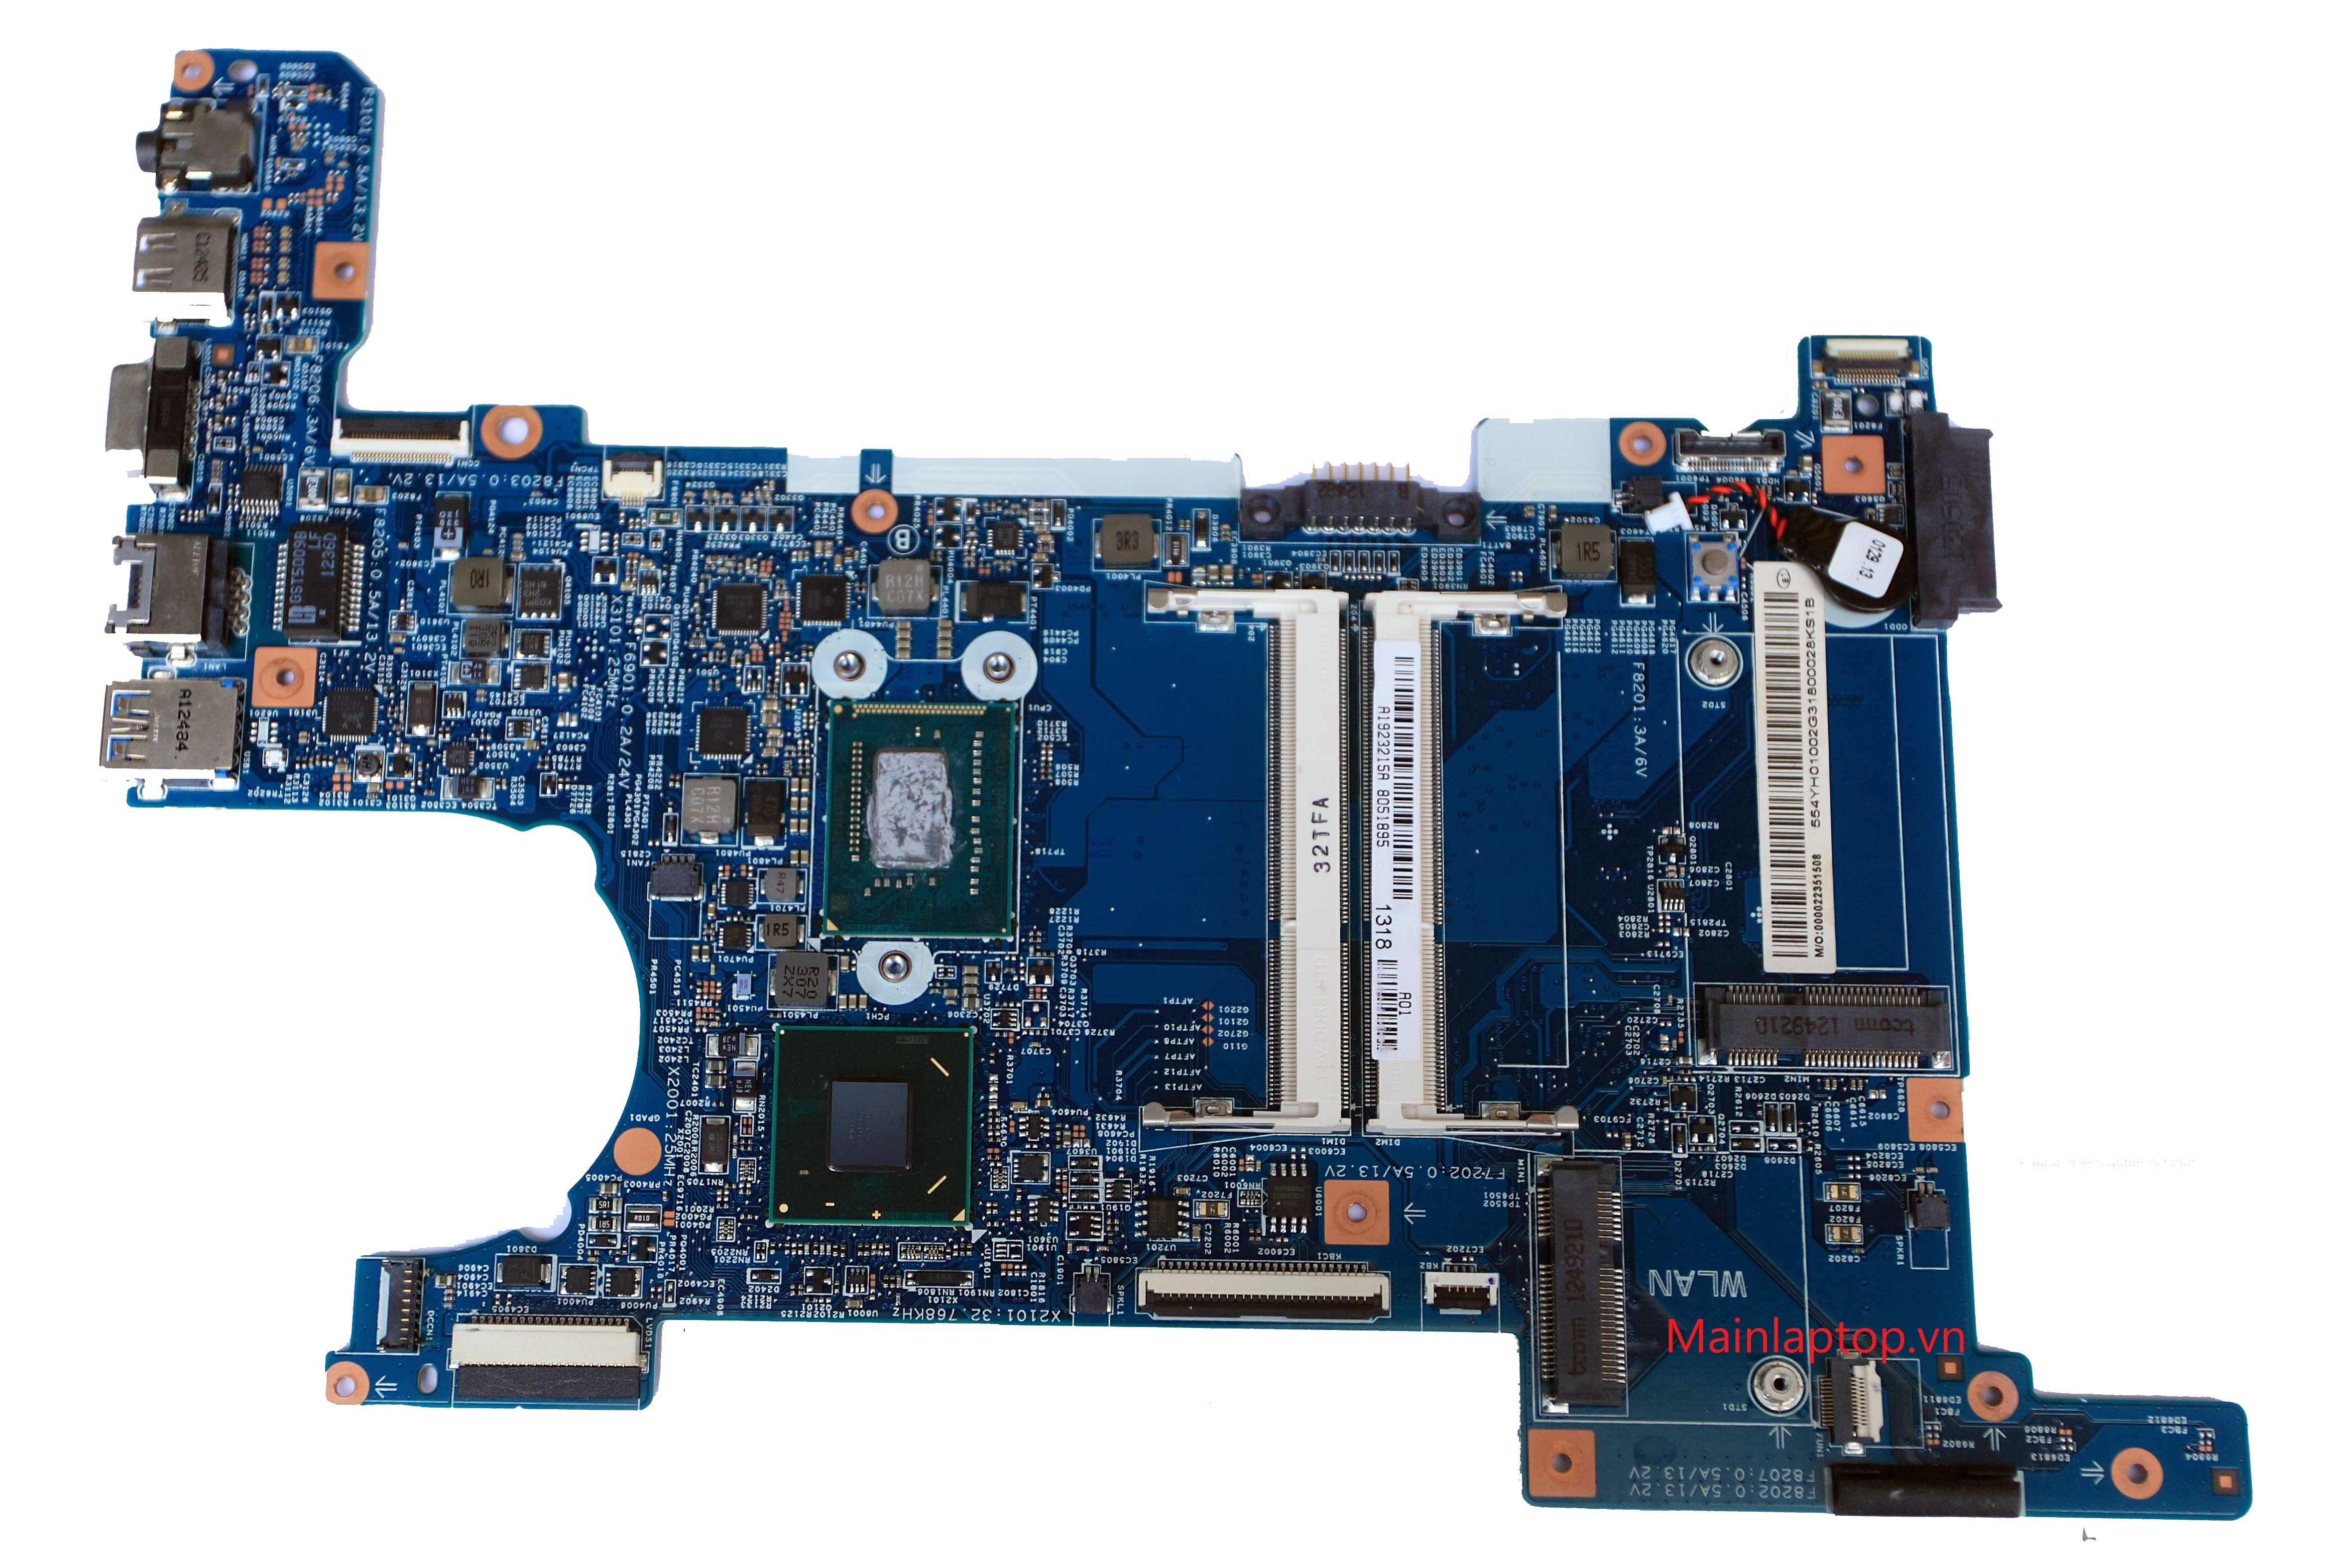 Main Sony SVT15 MBX-280